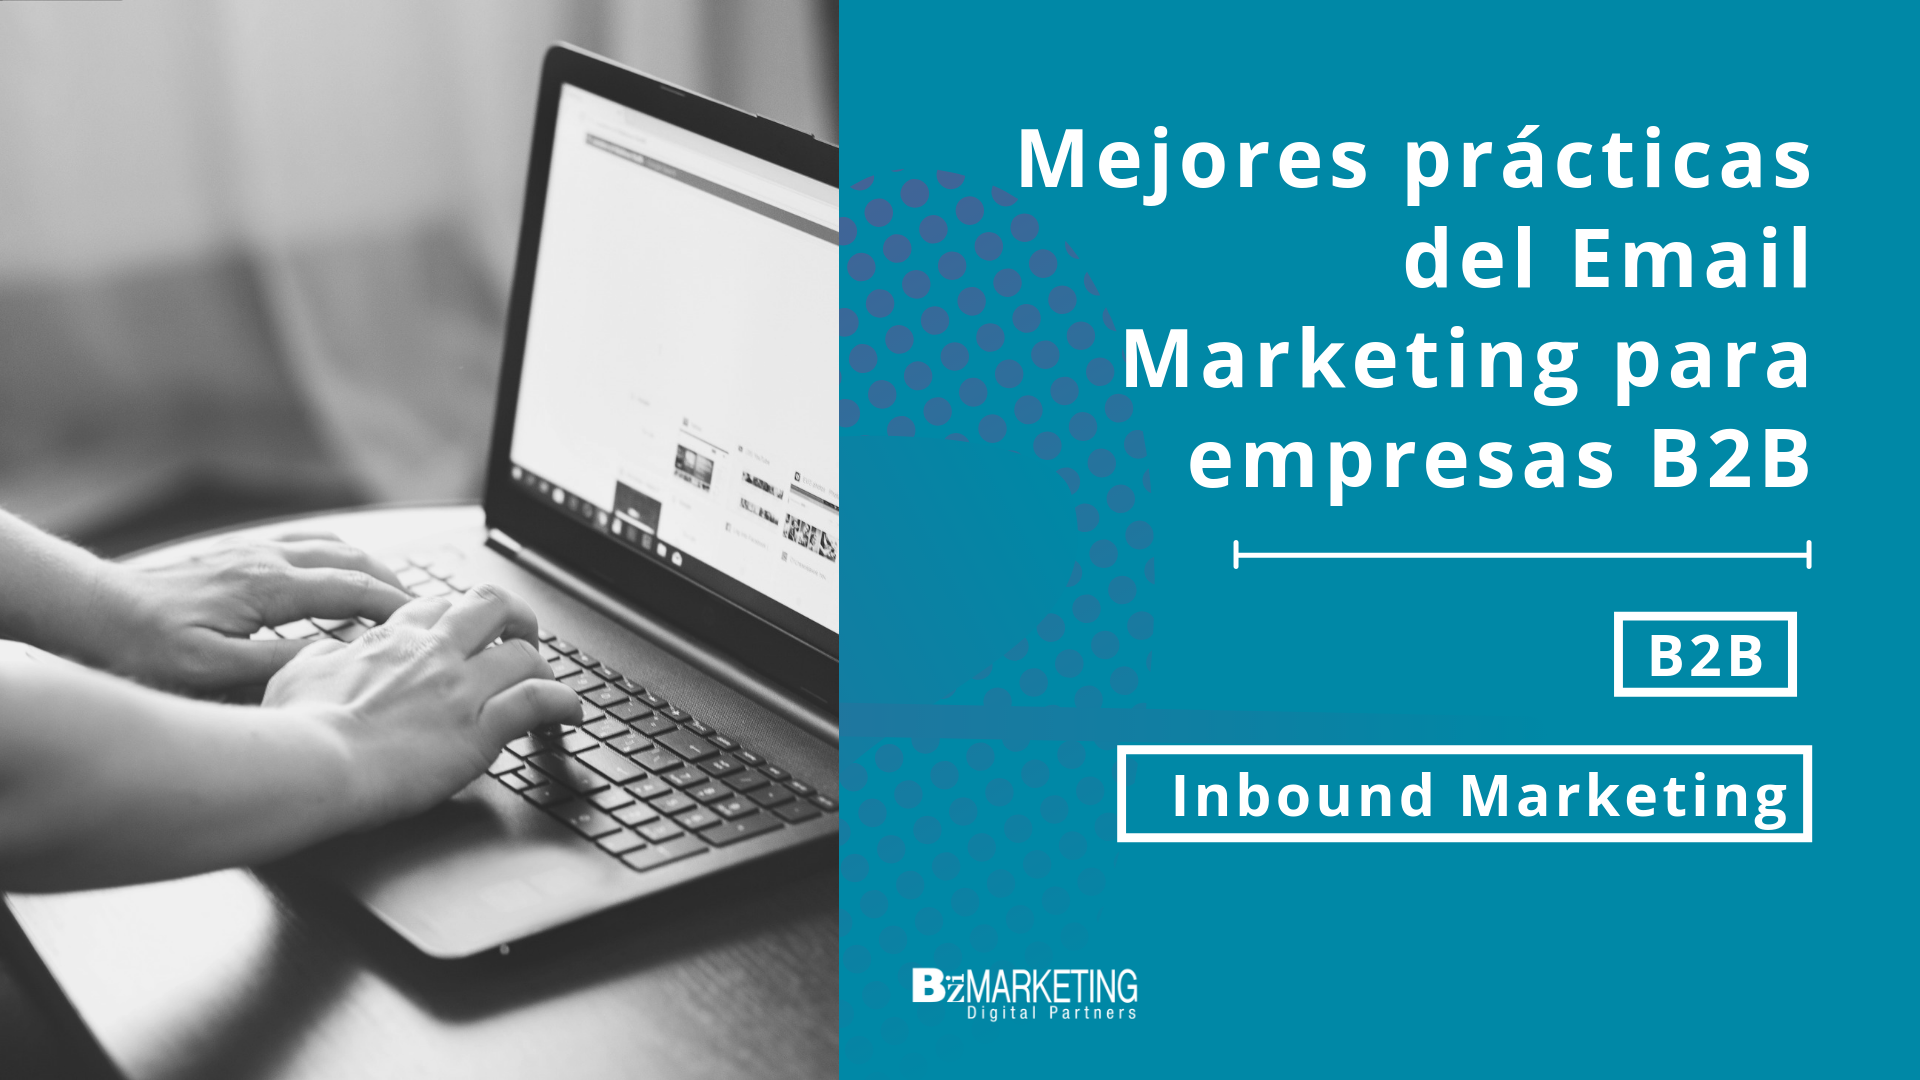 practicas-email-marketing-para-empresas-b2b-bizmarketing